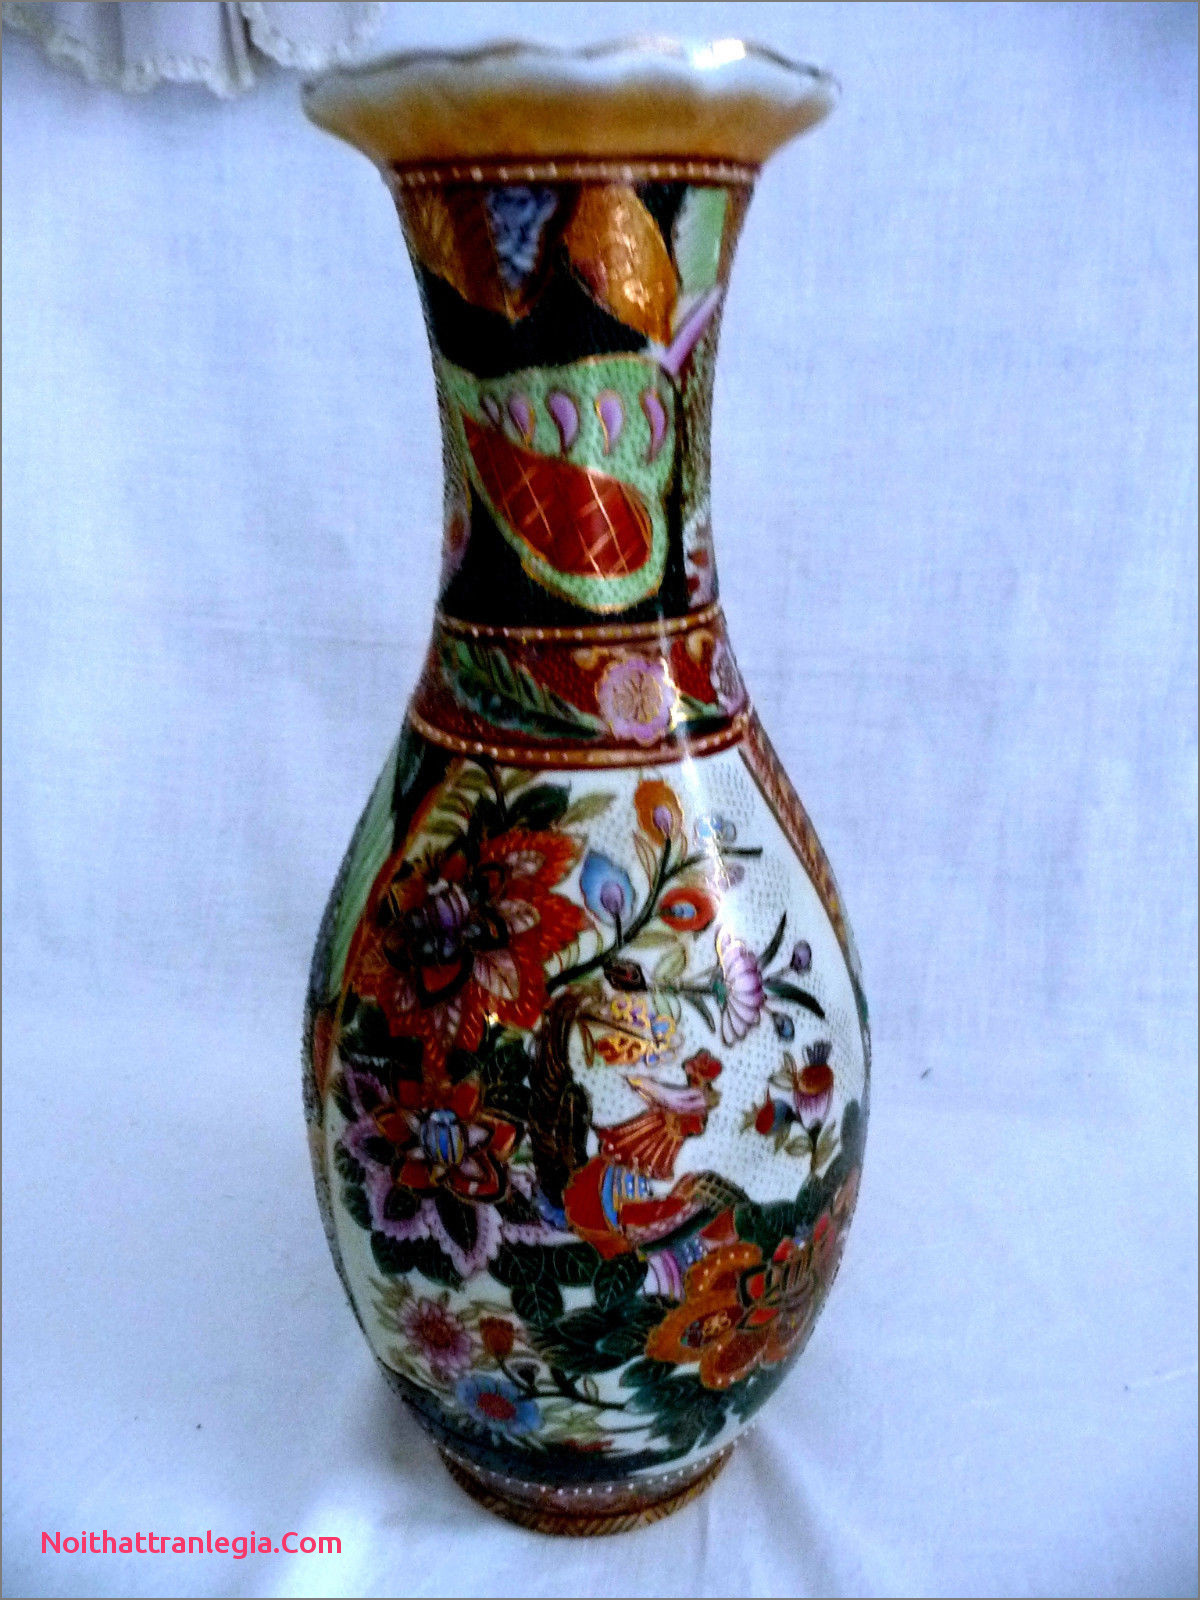 blue white vases wholesale of 20 chinese antique vase noithattranlegia vases design with regard to 1 von 11 siehe mehr